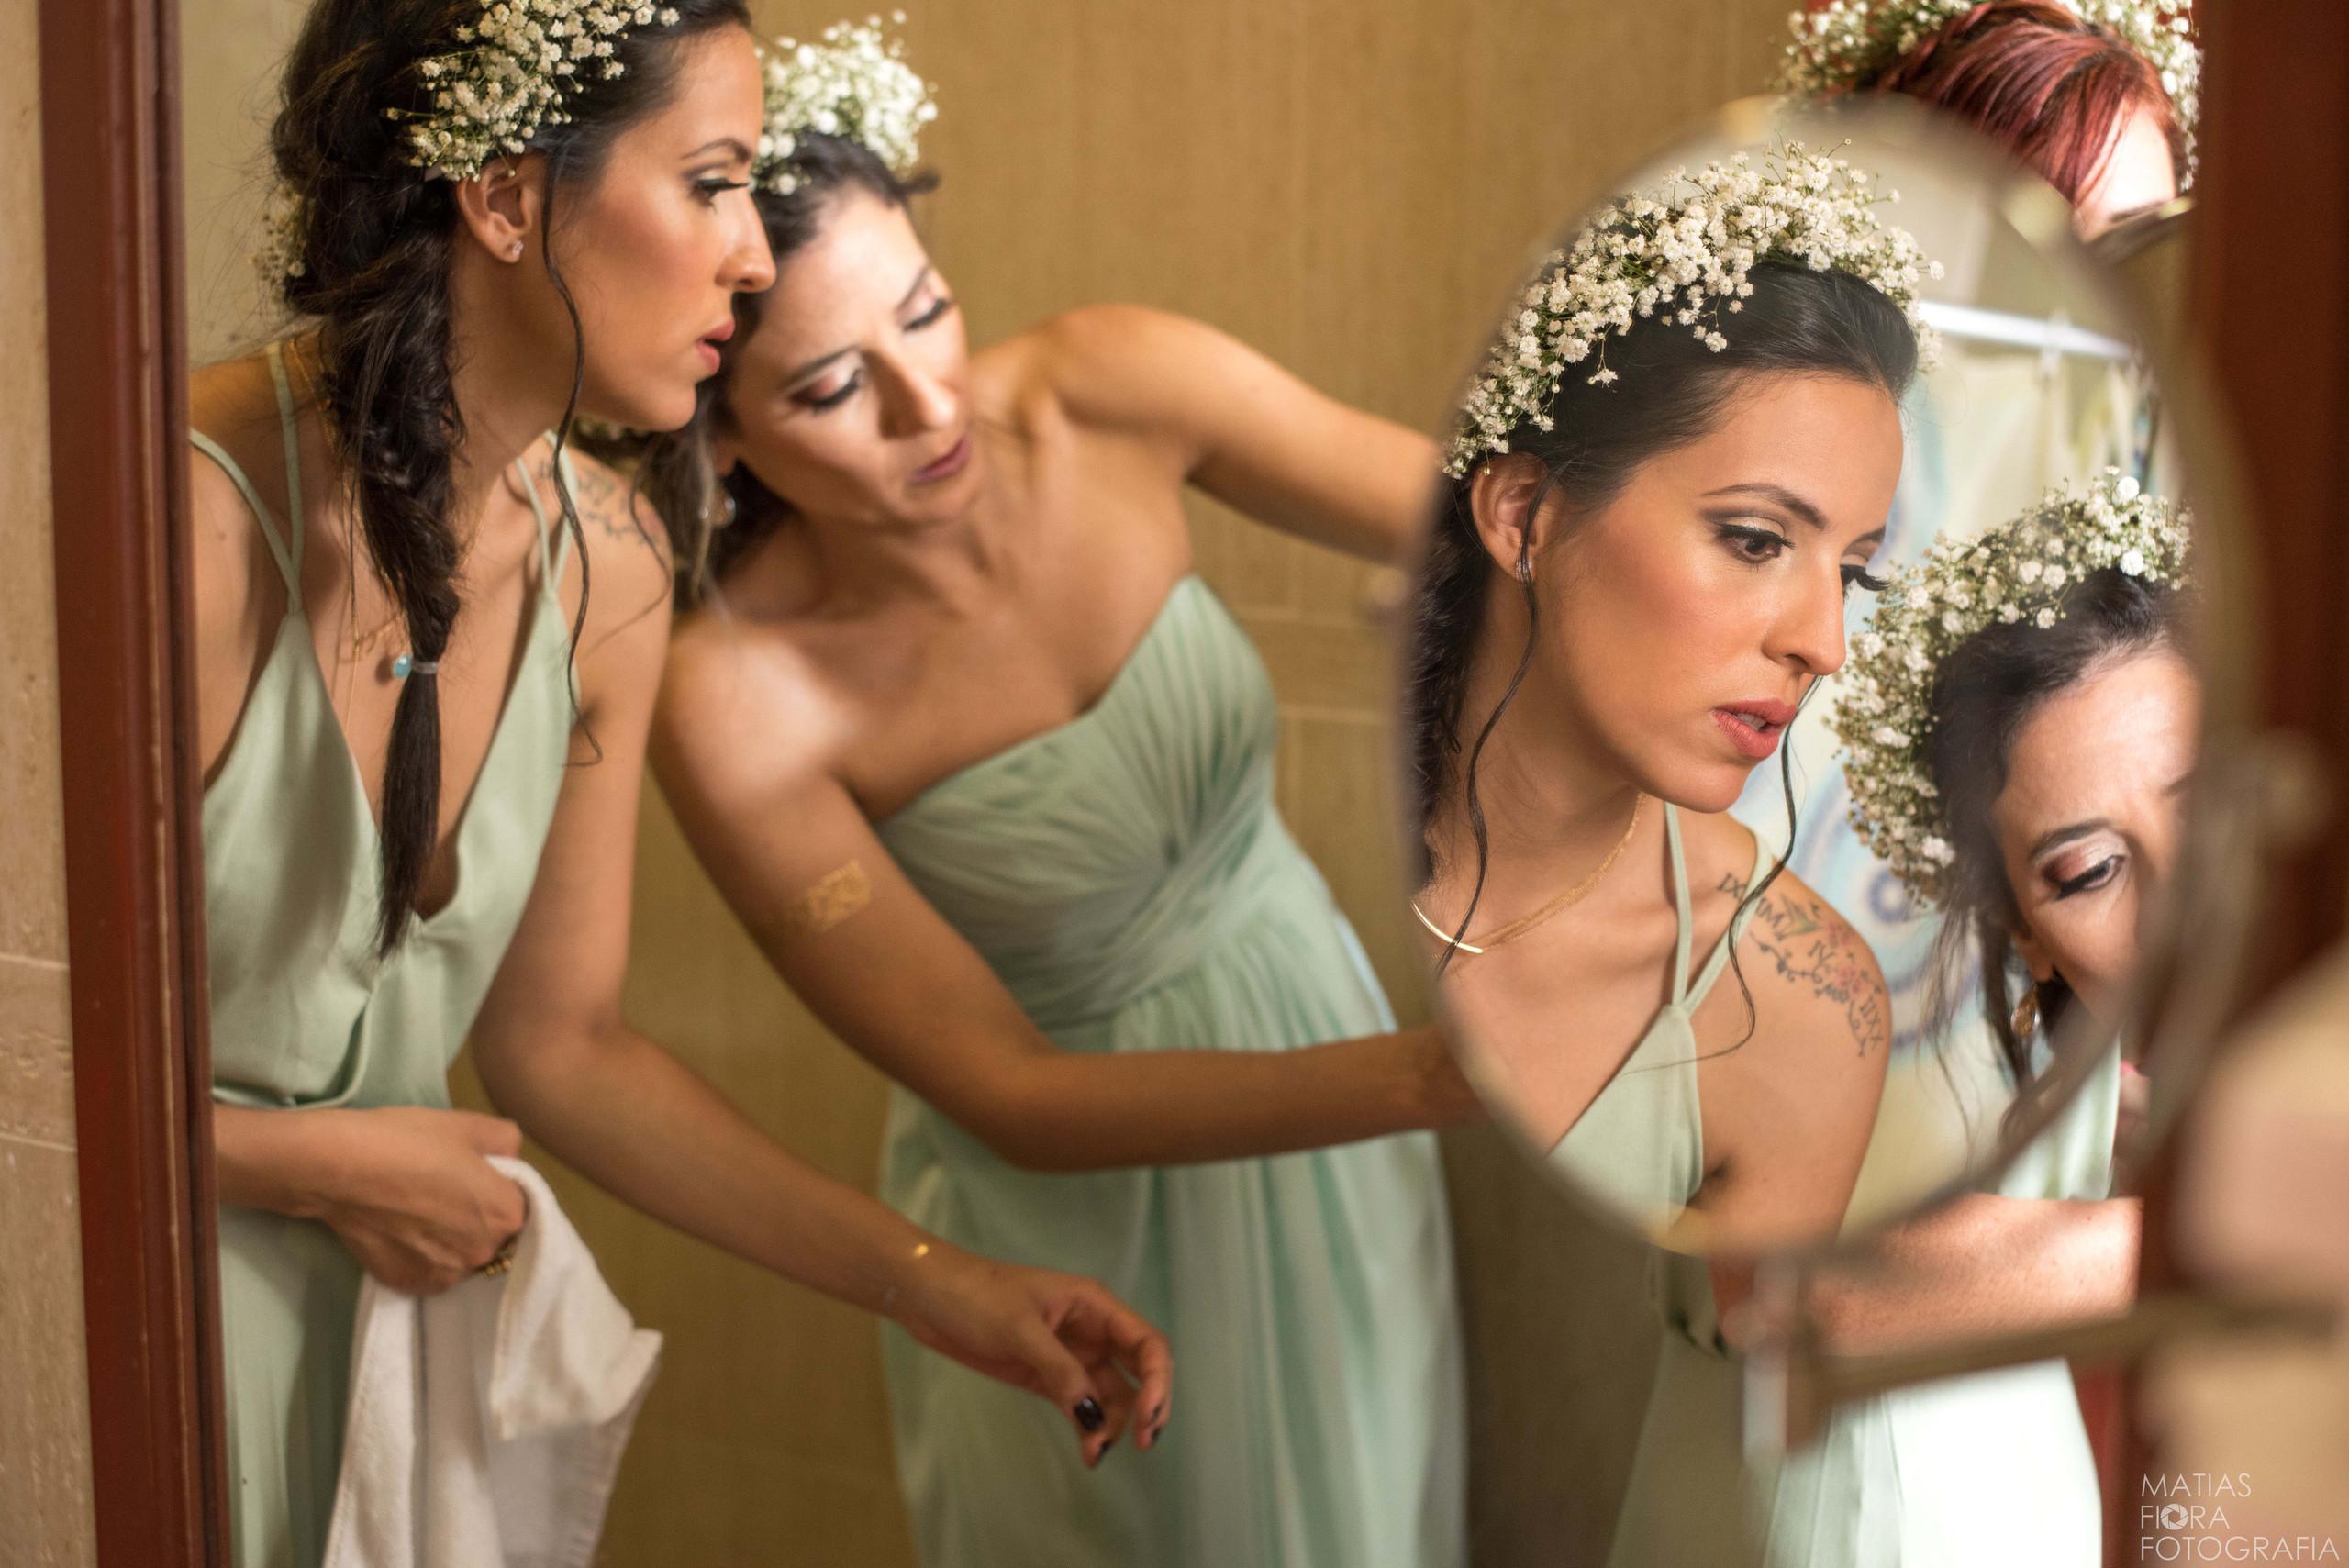 Fotografia de bodas en Cancun, Hotel @dosplayas